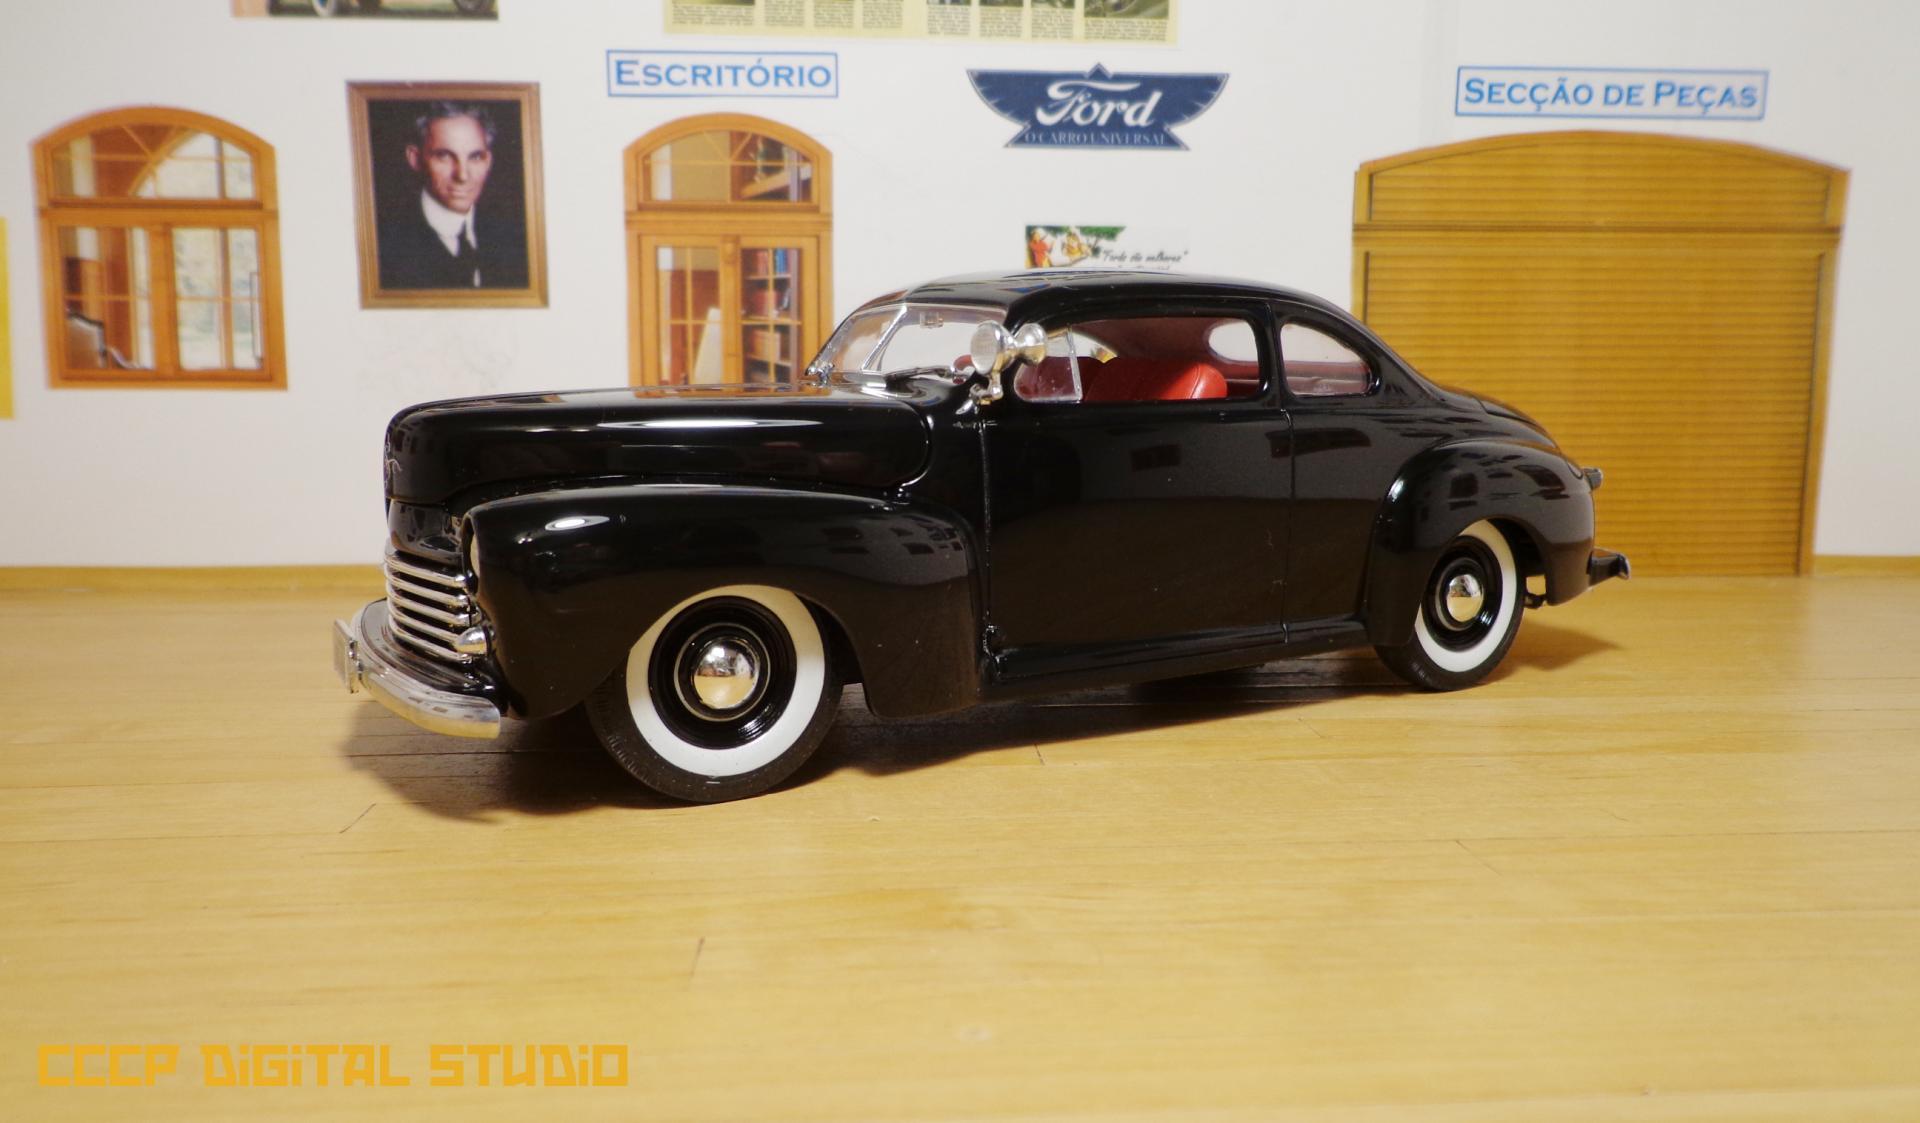 1948 Ford Custom Coupe 001 copy.jpg